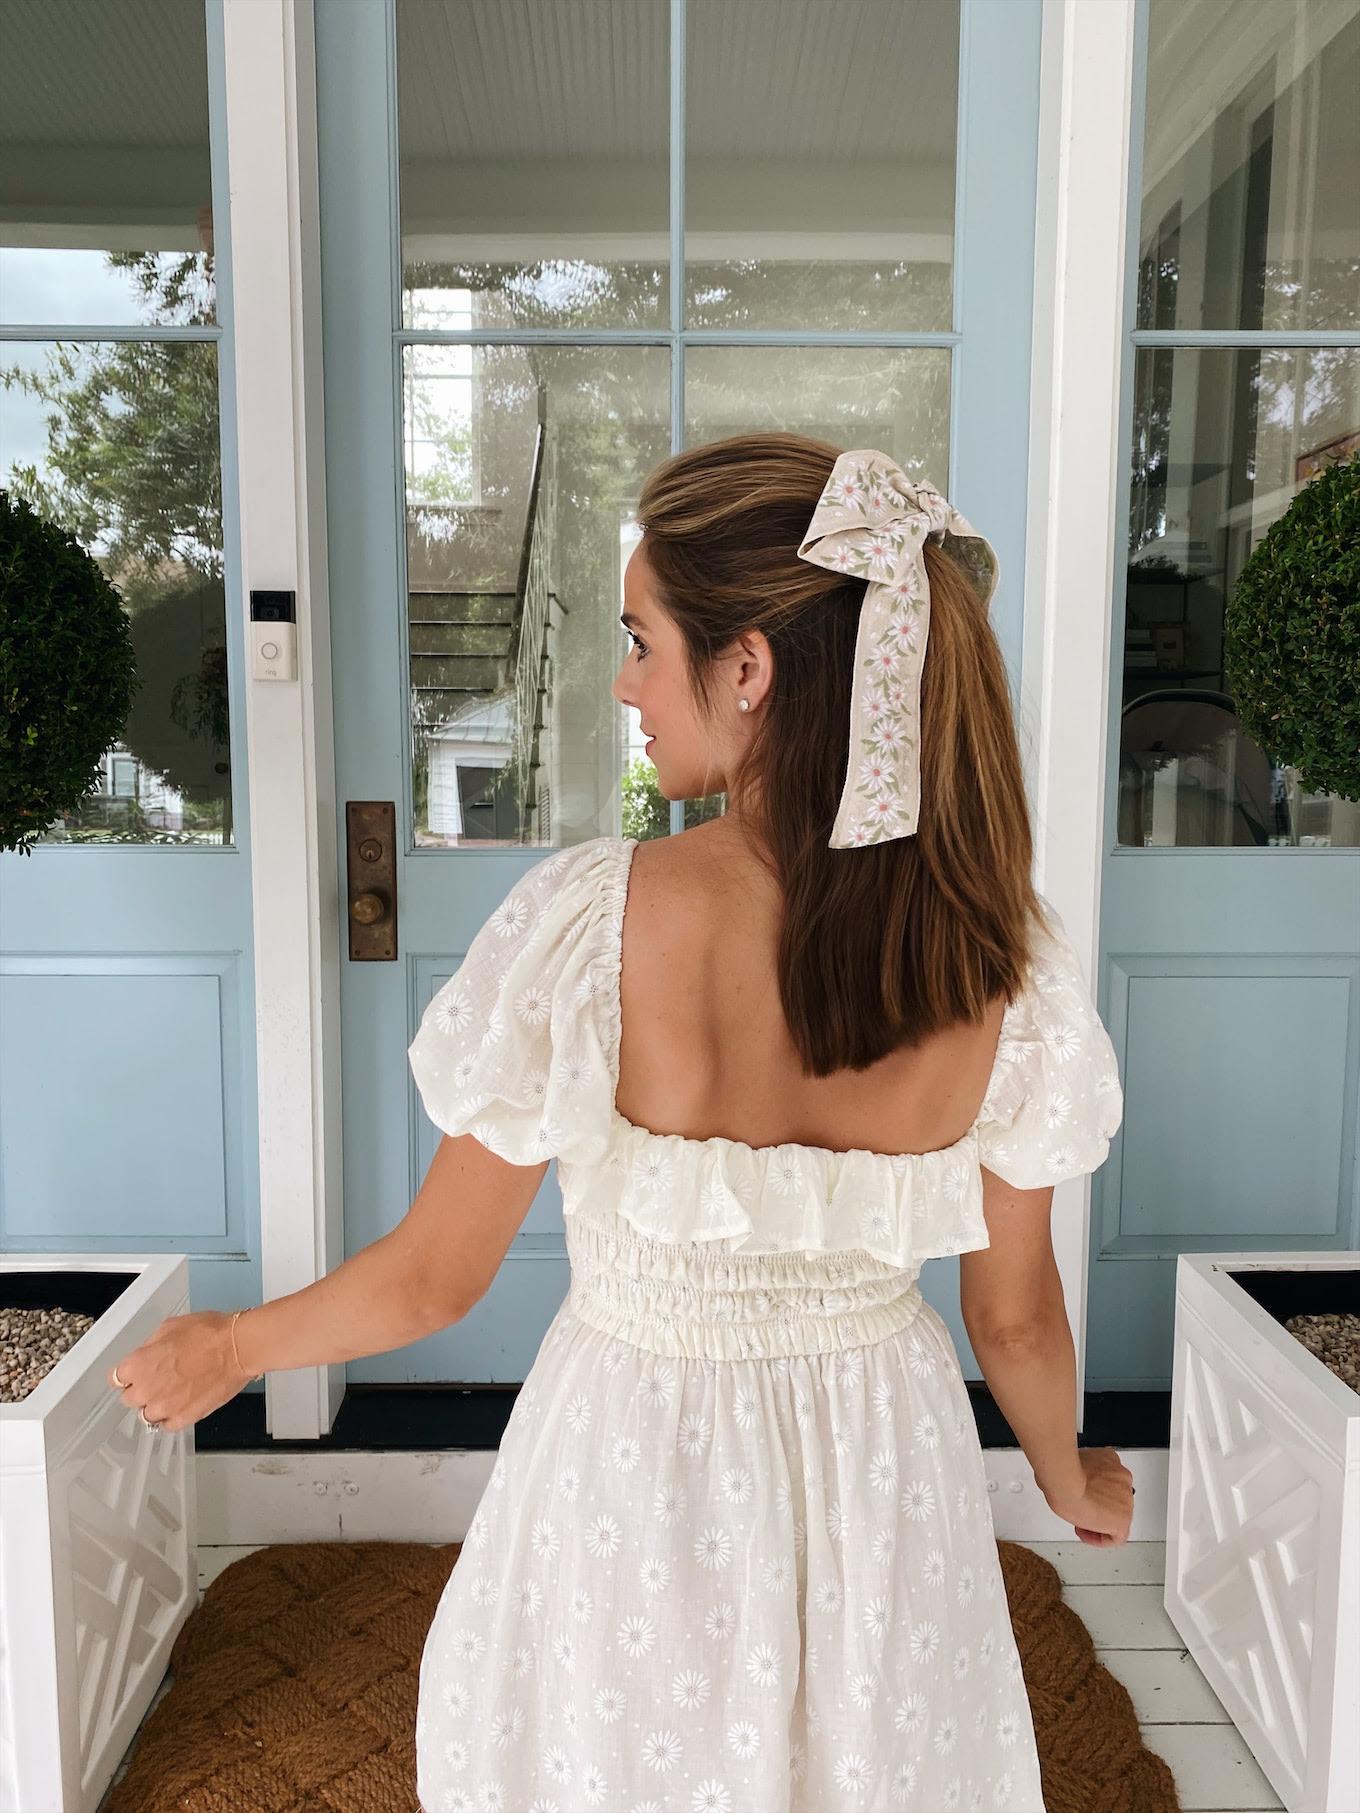 floral bow hair accessory